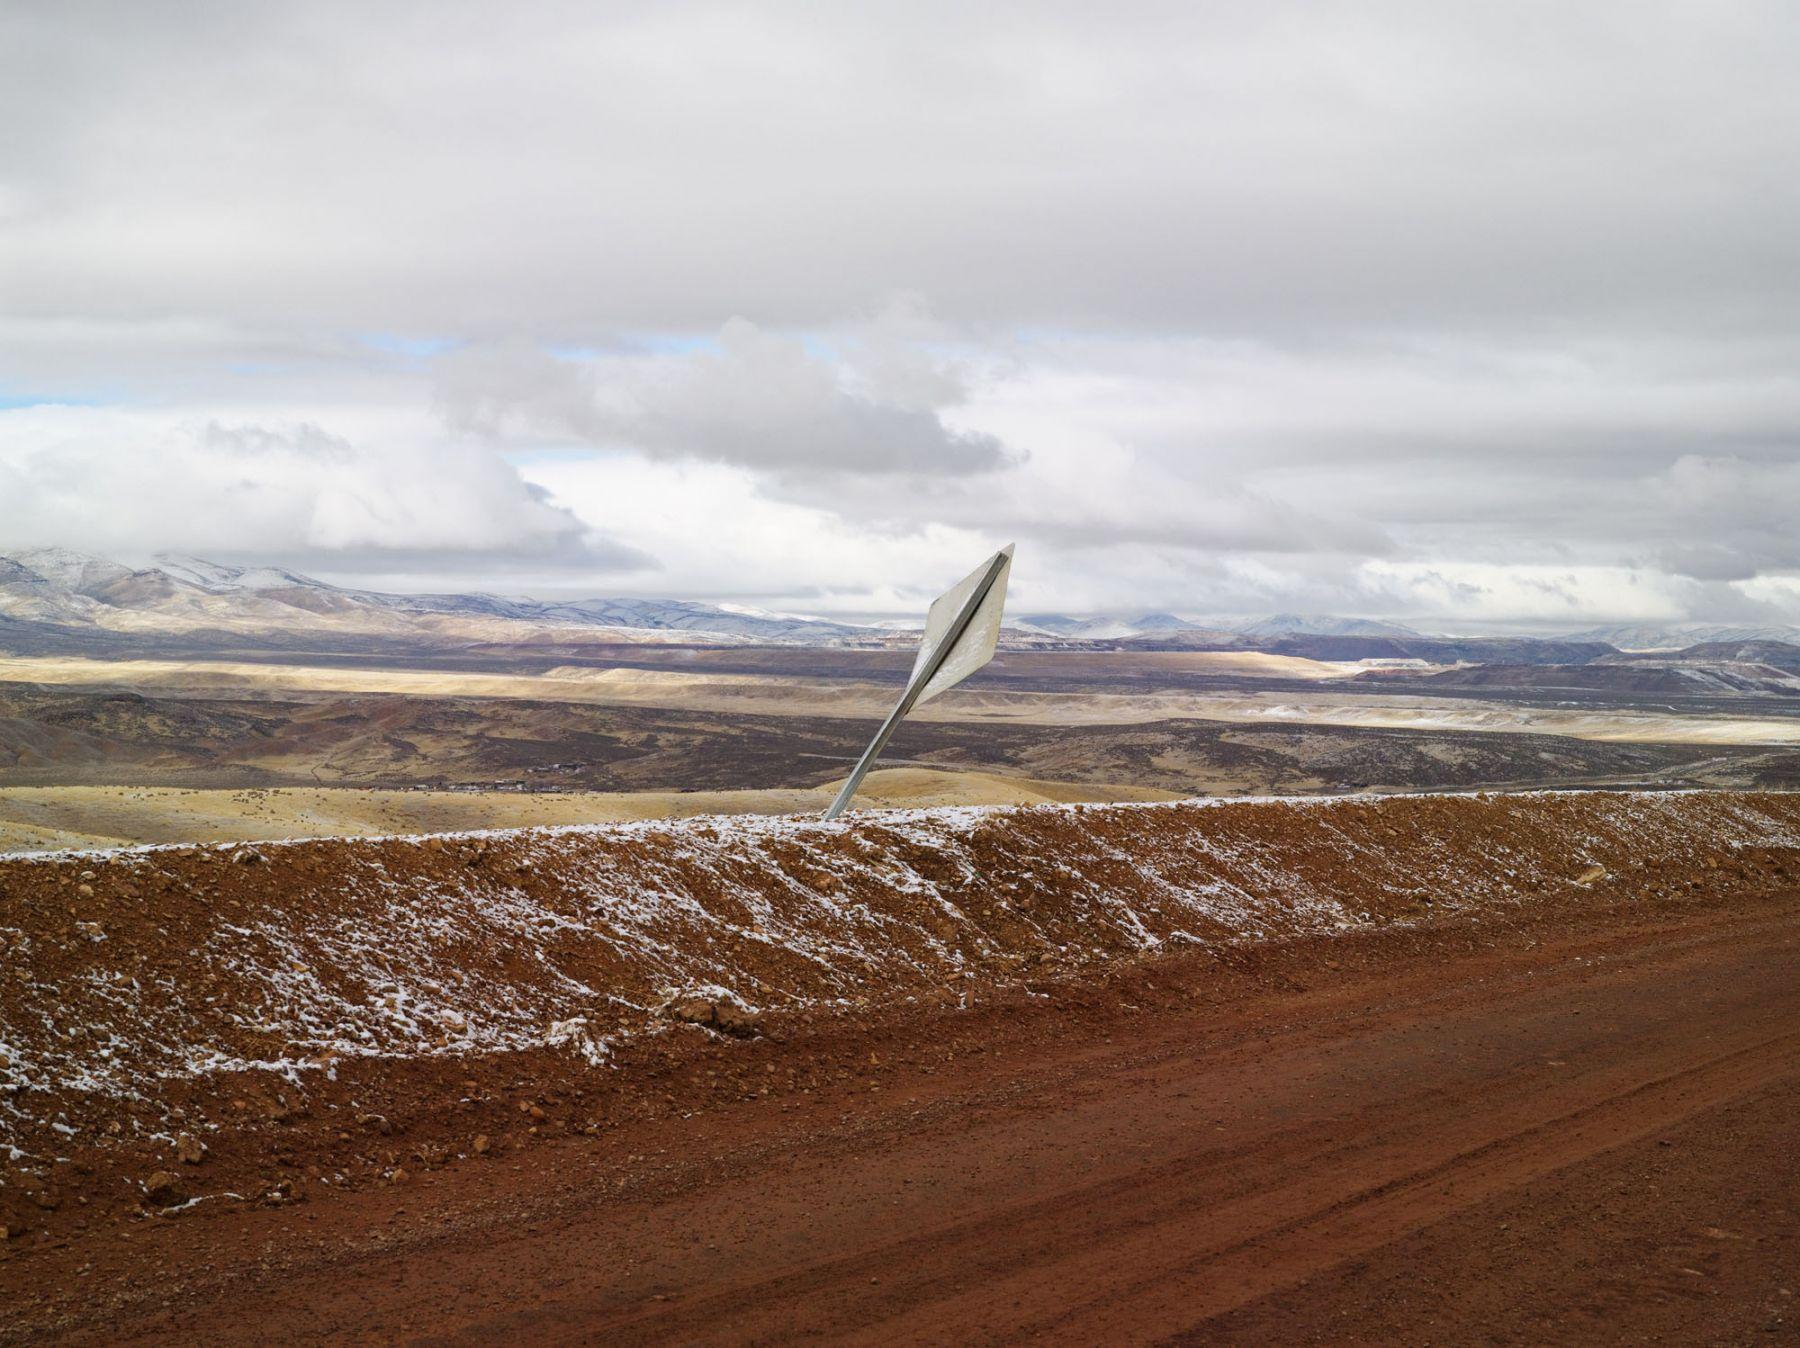 LUCAS FOGLIA, New Mining Road, Carlin, Nevada, 2012